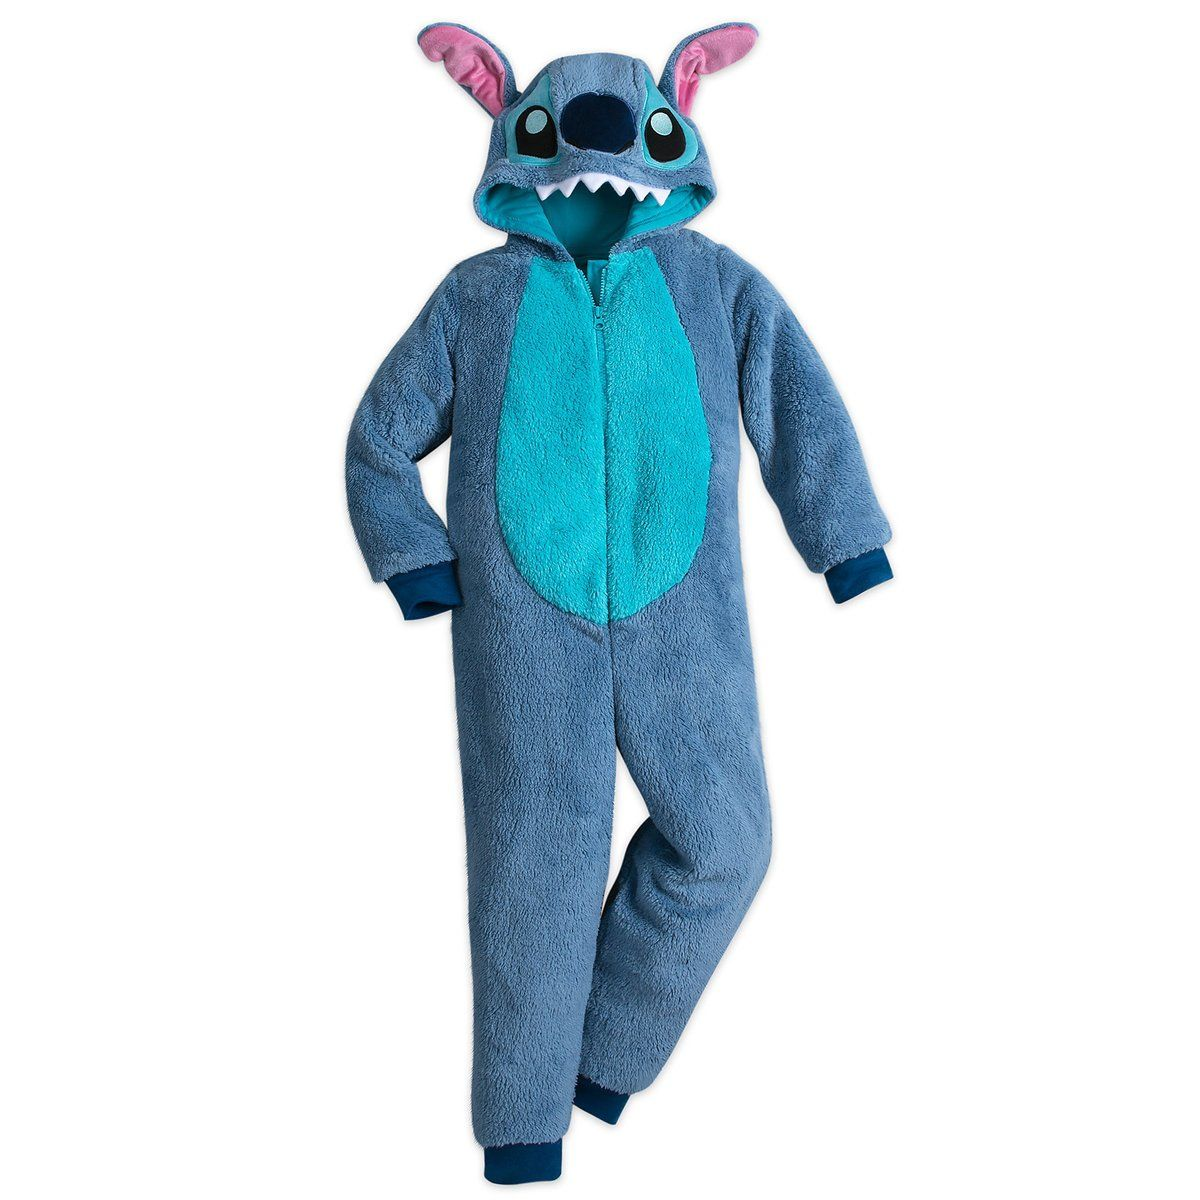 Disney Stitch Costume for Kids in 2020 Stitch costume